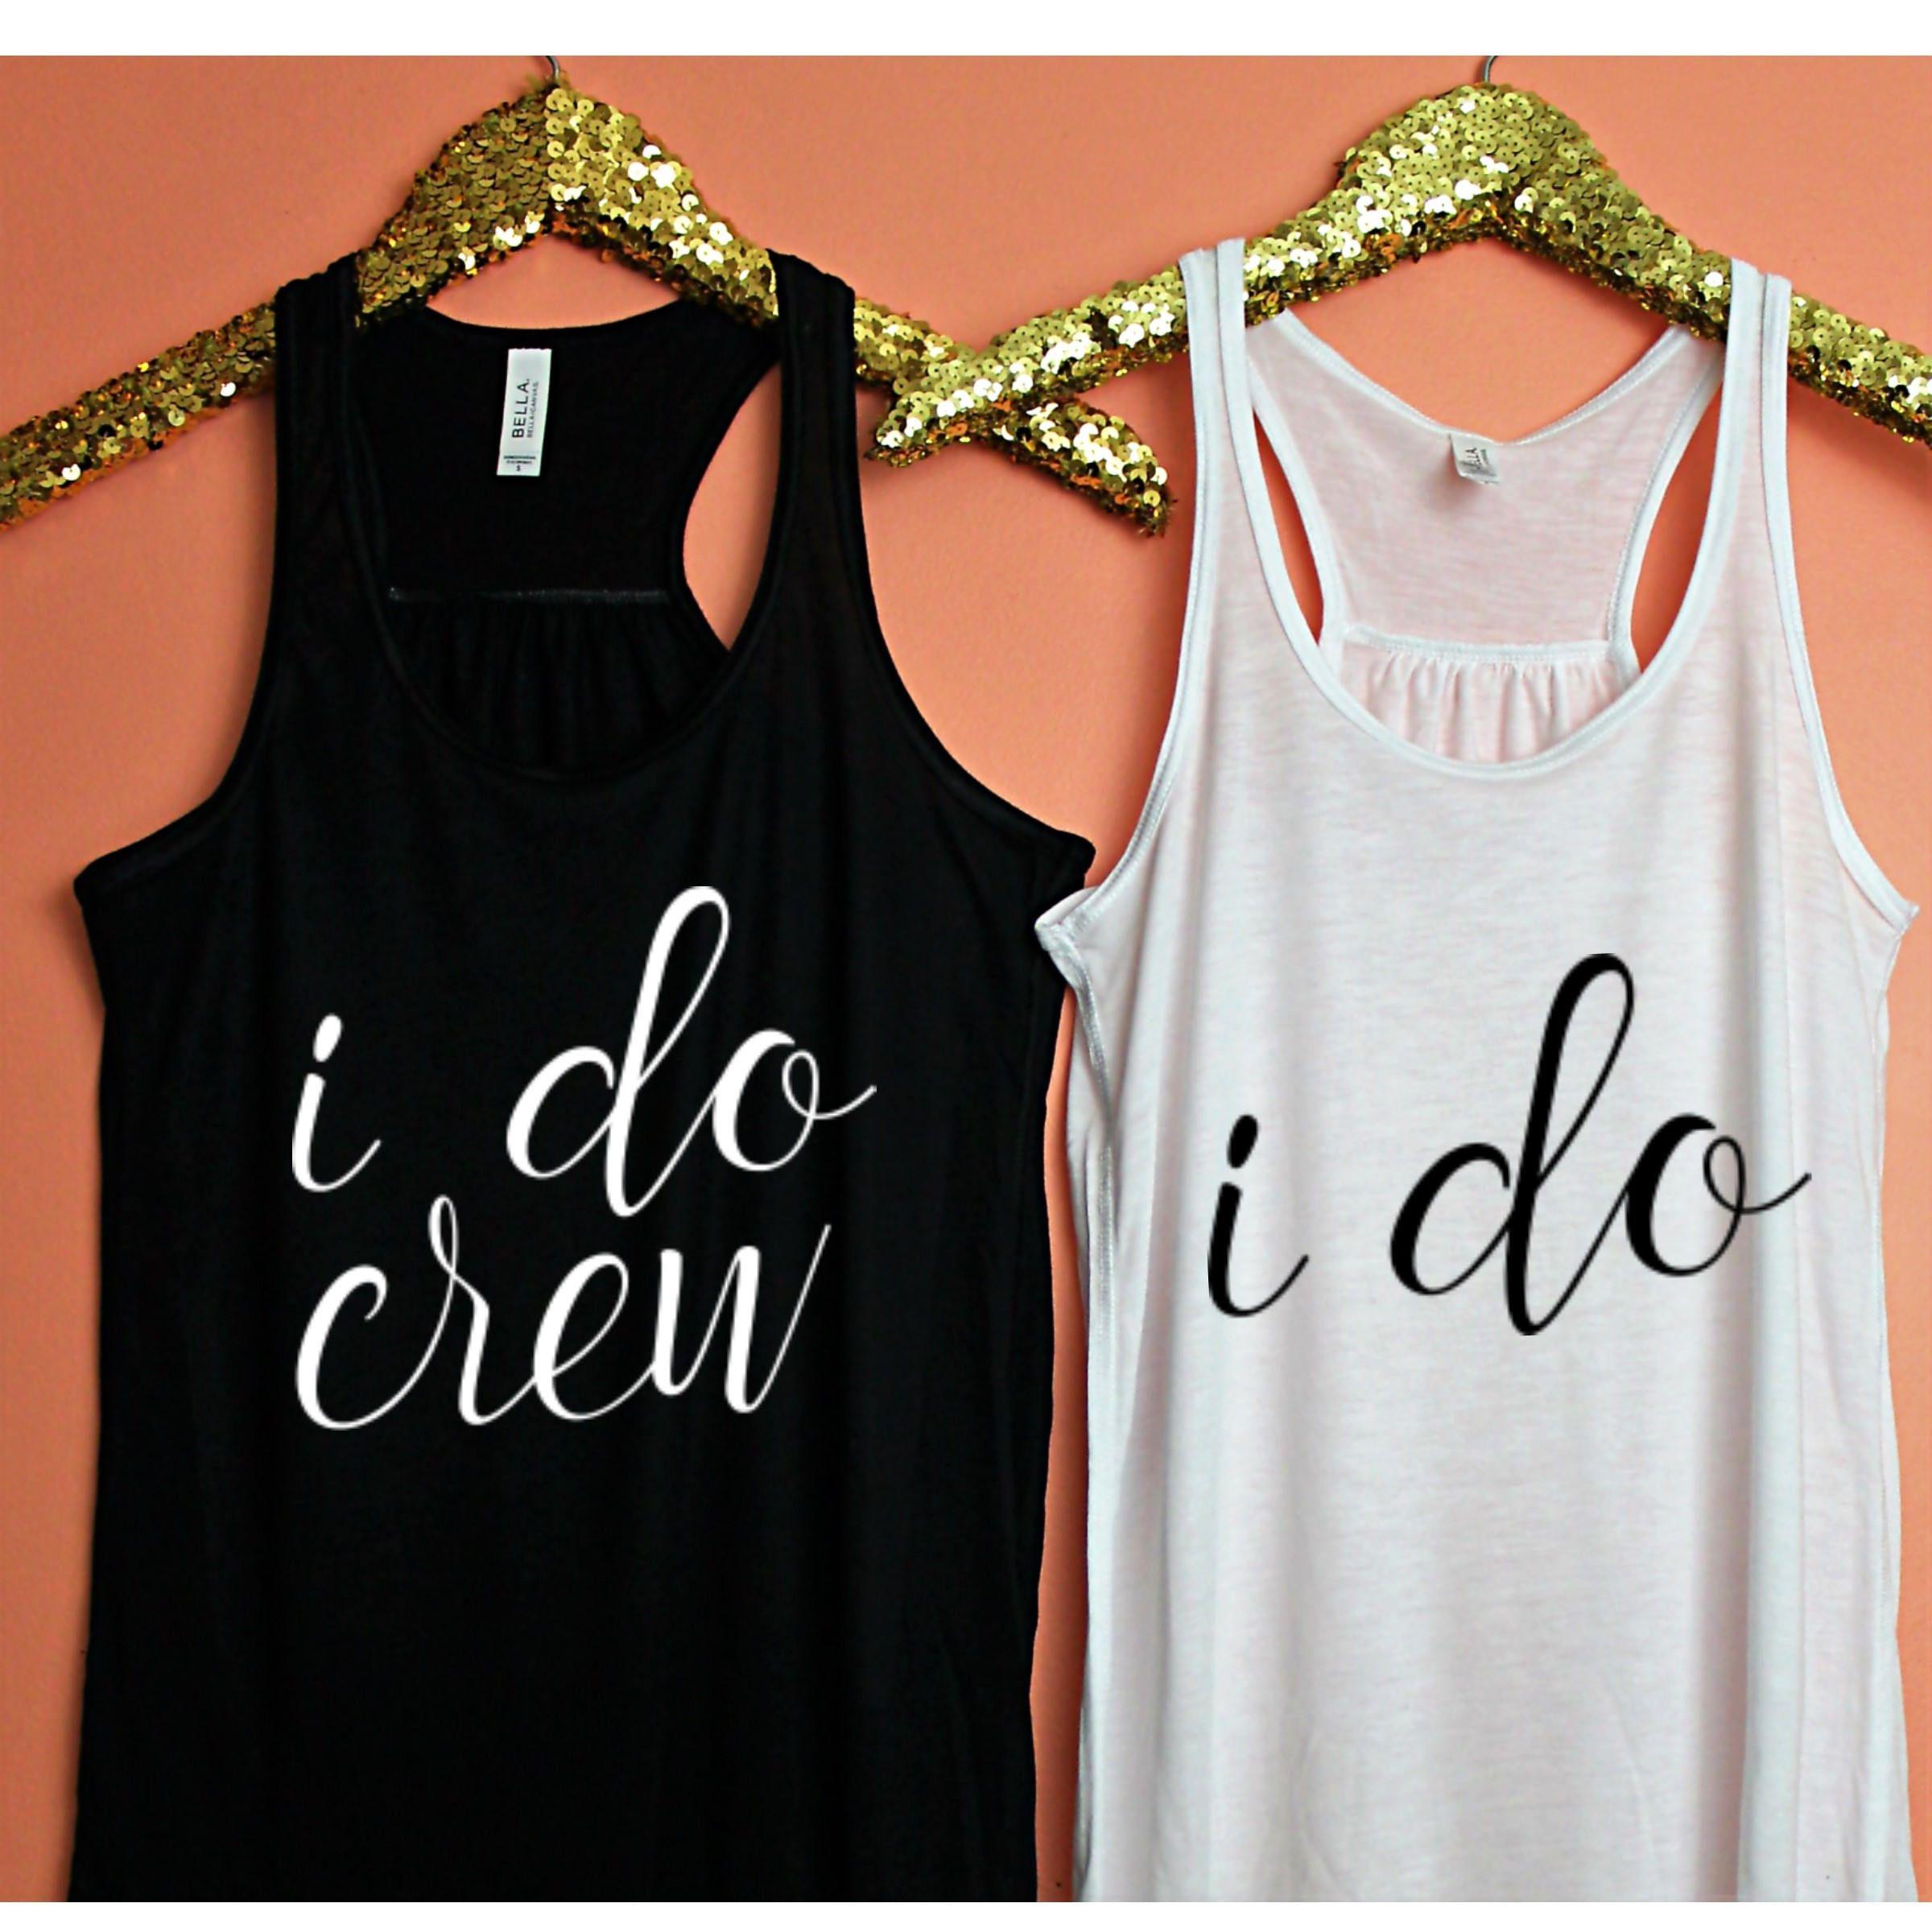 a7addcf50f6e9 Bachelorette Party Shirts